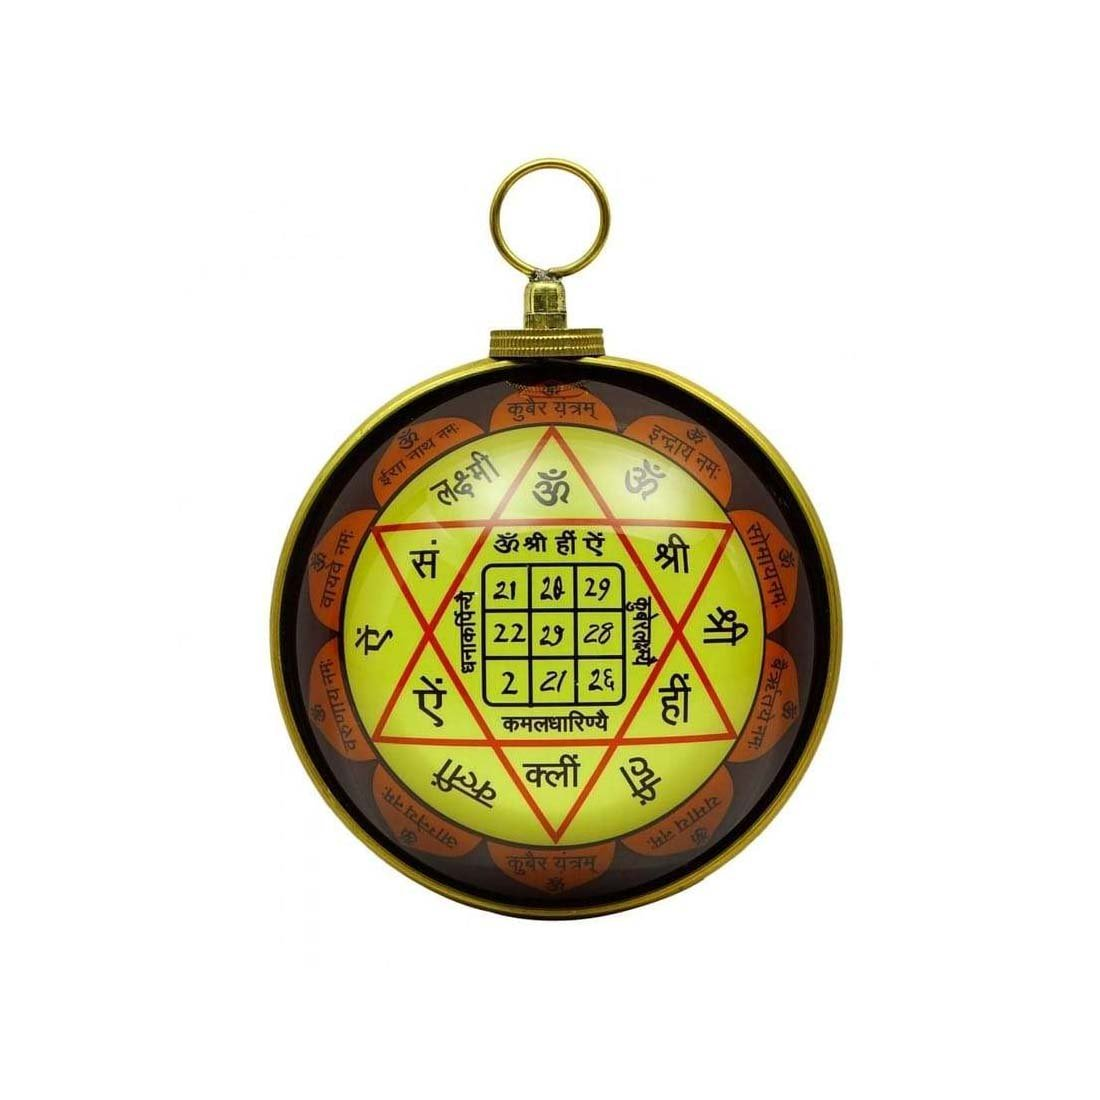 Indian Handicrafts Export Kuber Yantra For Wealth Hanging- Brass